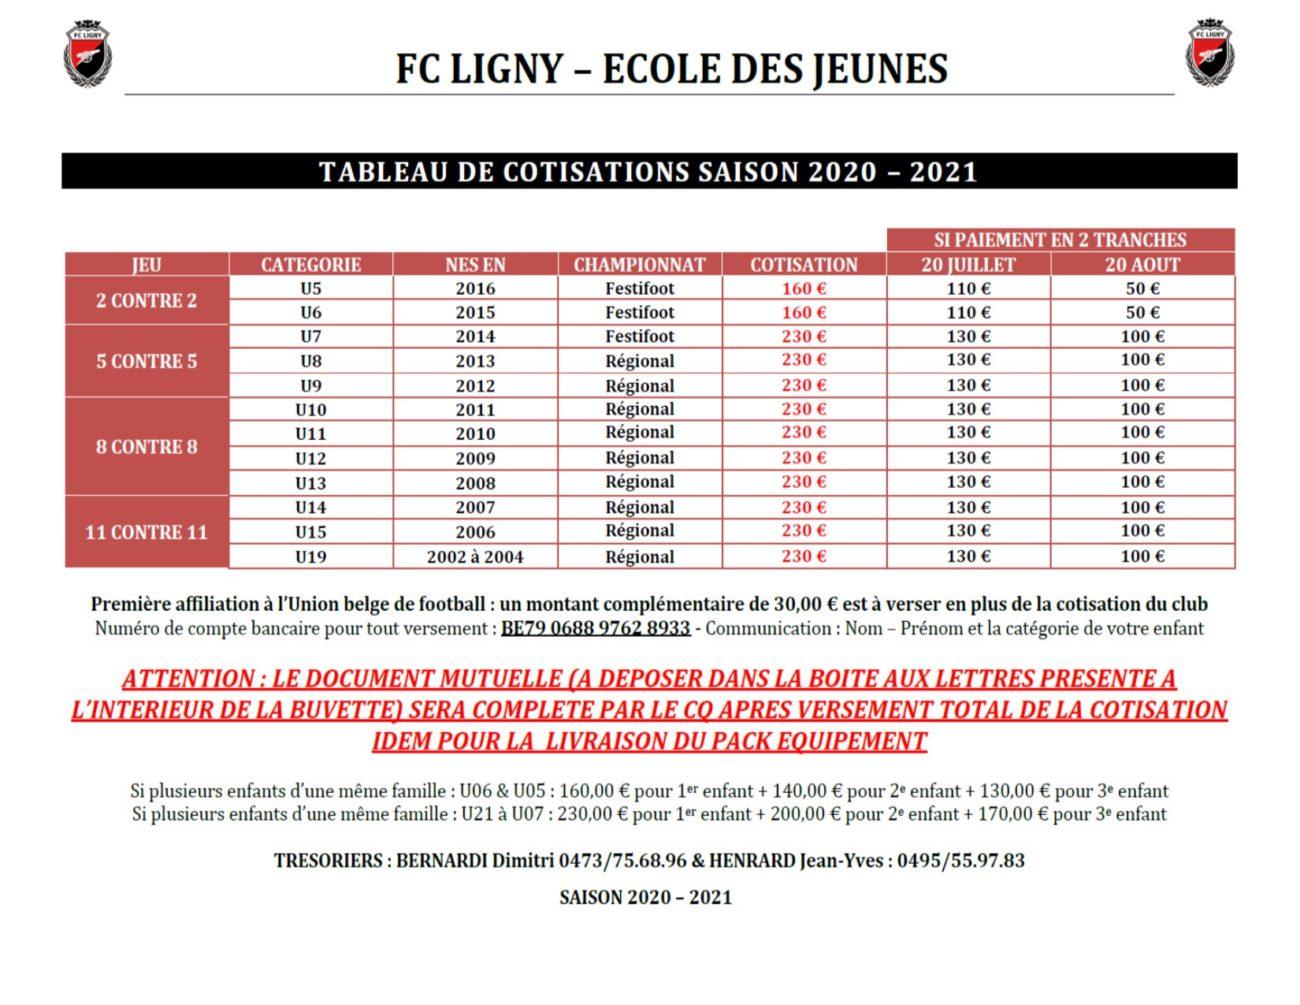 Tableau Des Cotisations 2020 2021